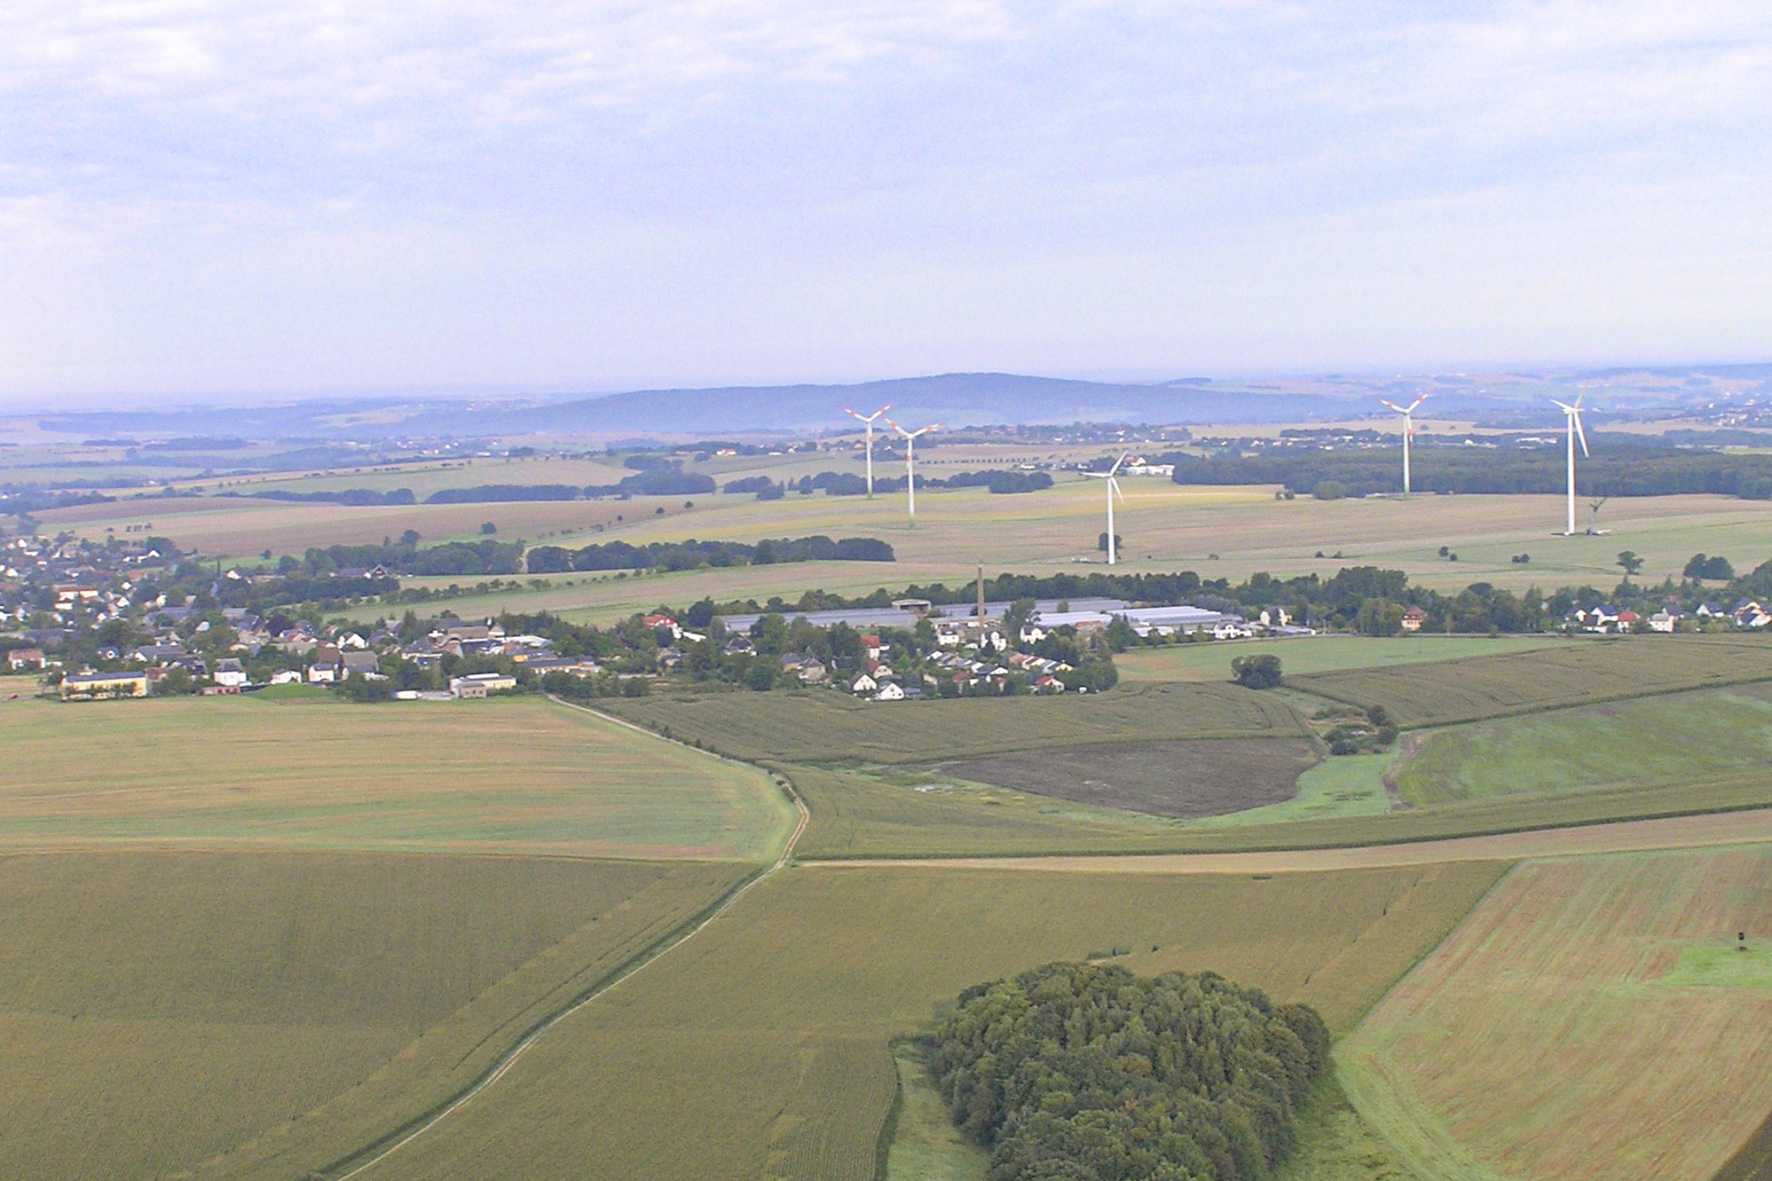 Ballonfahrt 2007